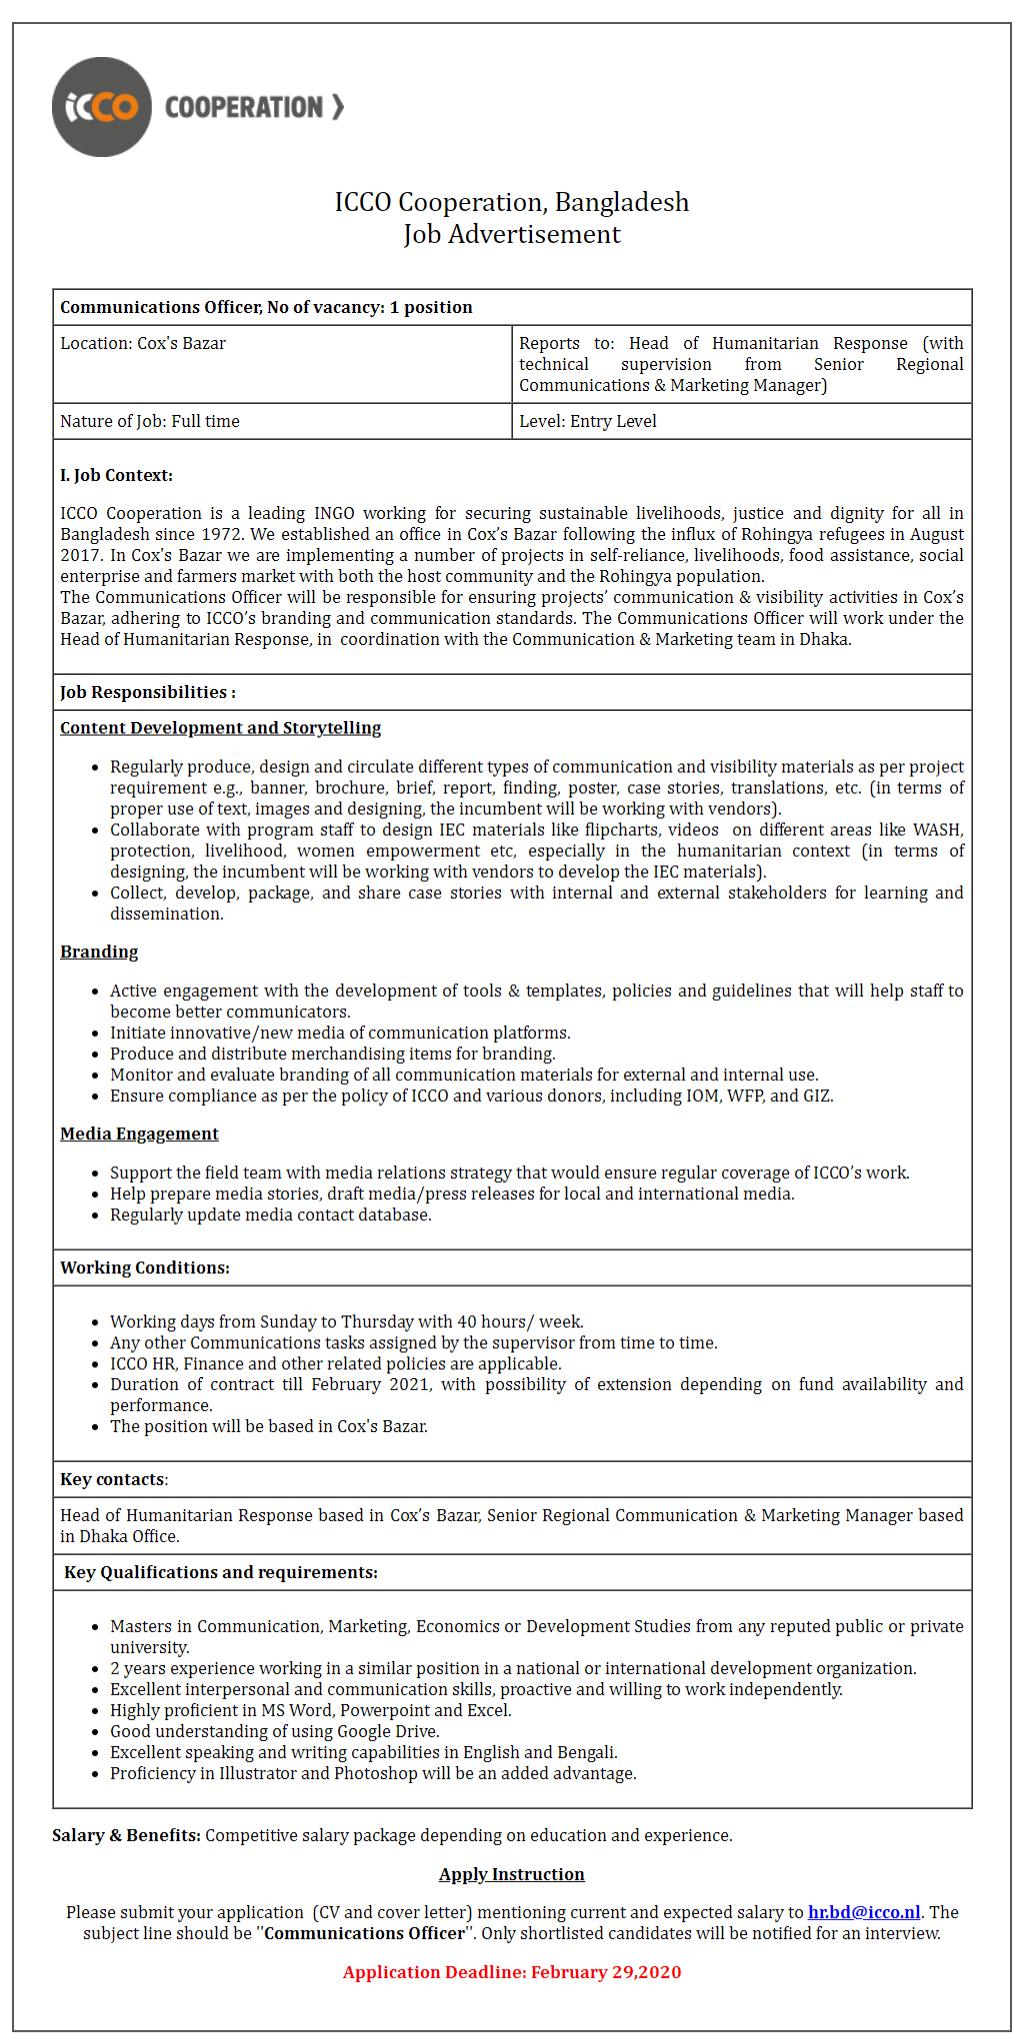 ICCO Cooperation Job Circular 2020